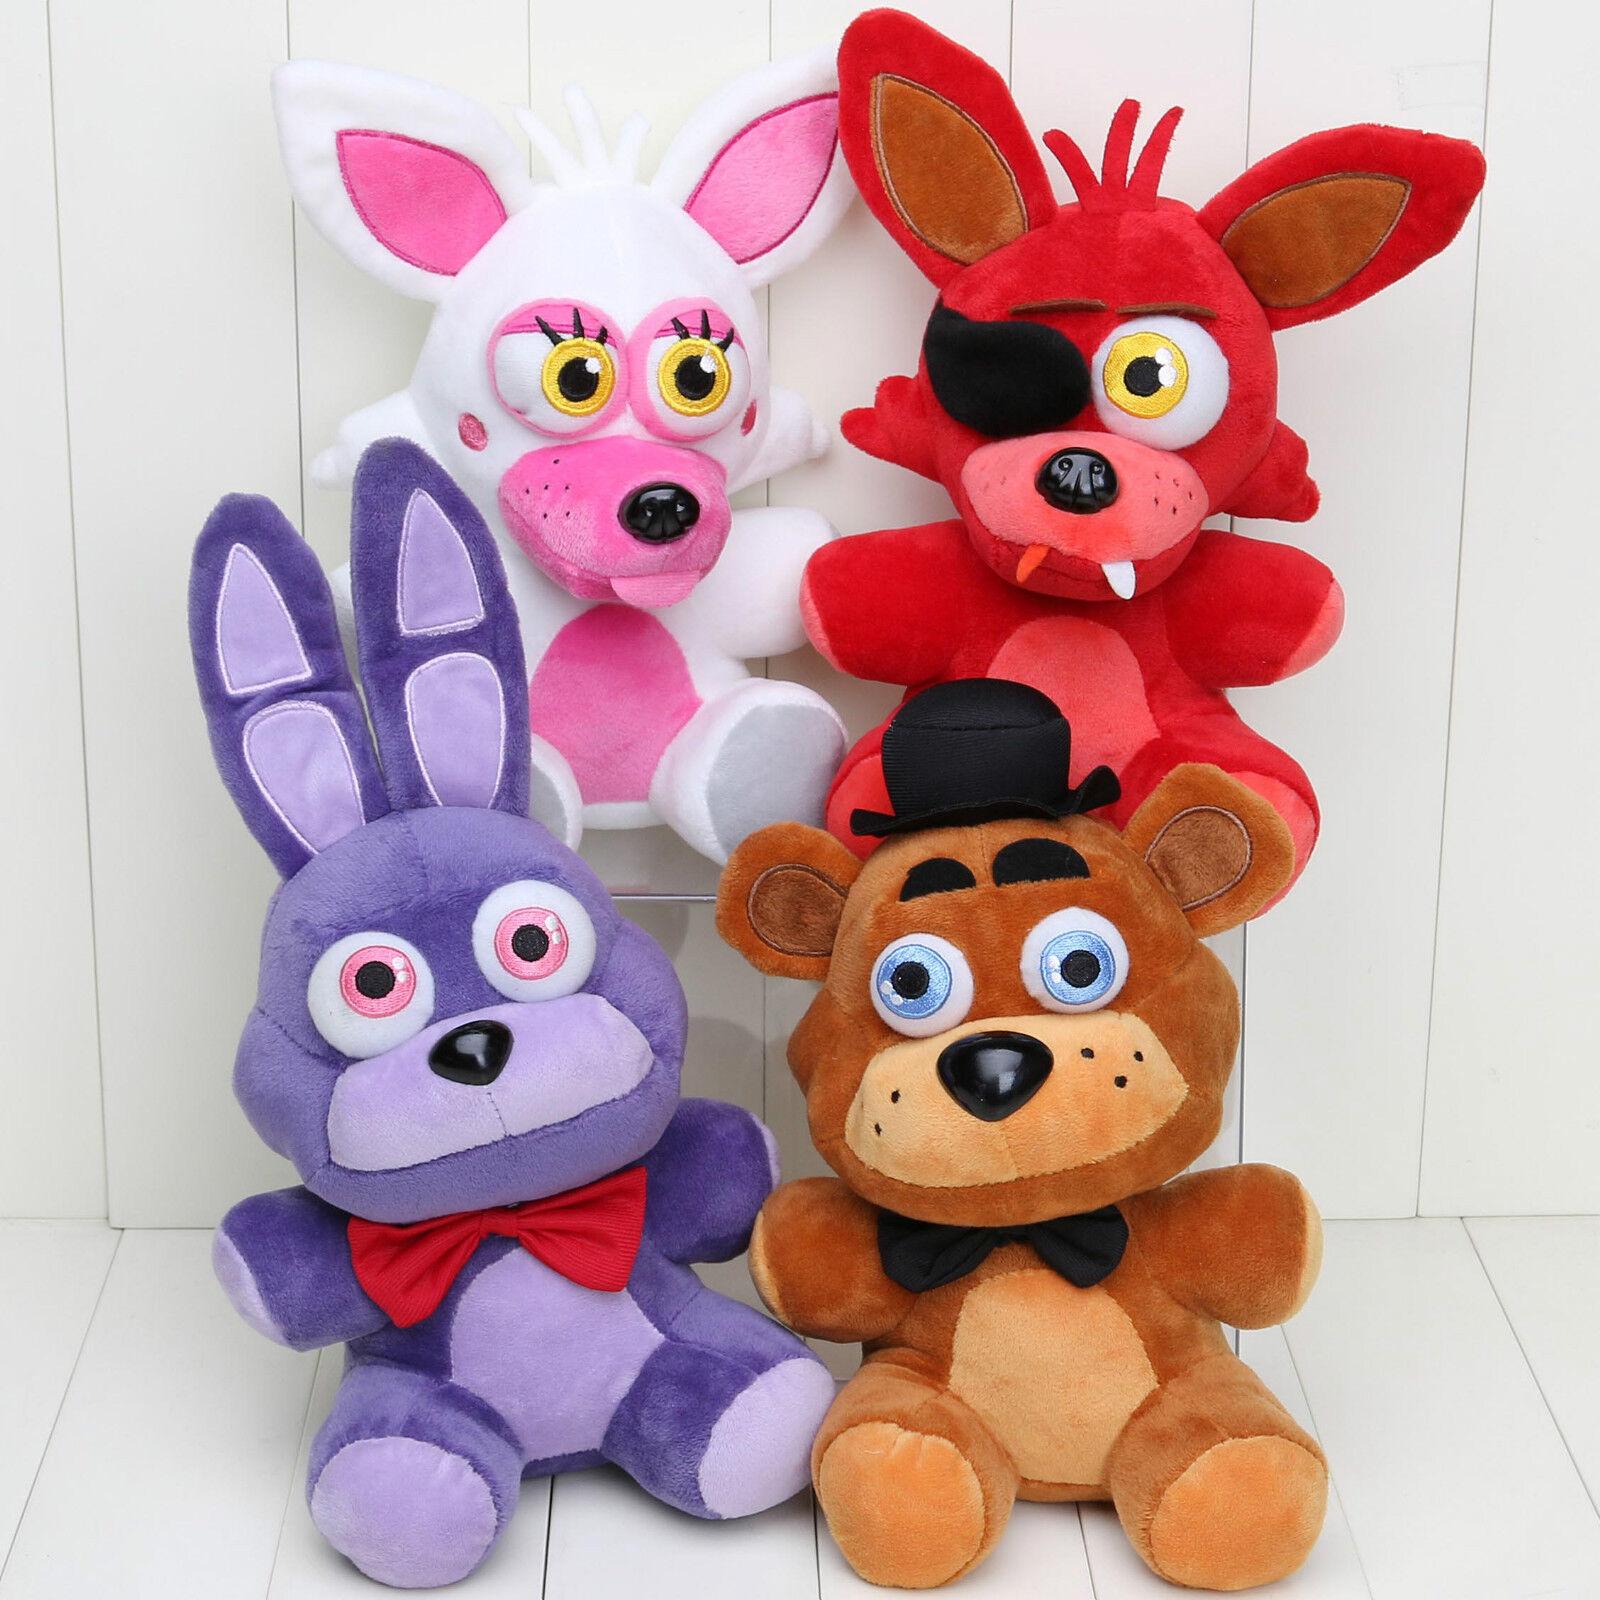 At freddy s 4 fnaf horror game plush dolls kids plushie toys 7 quot ebay